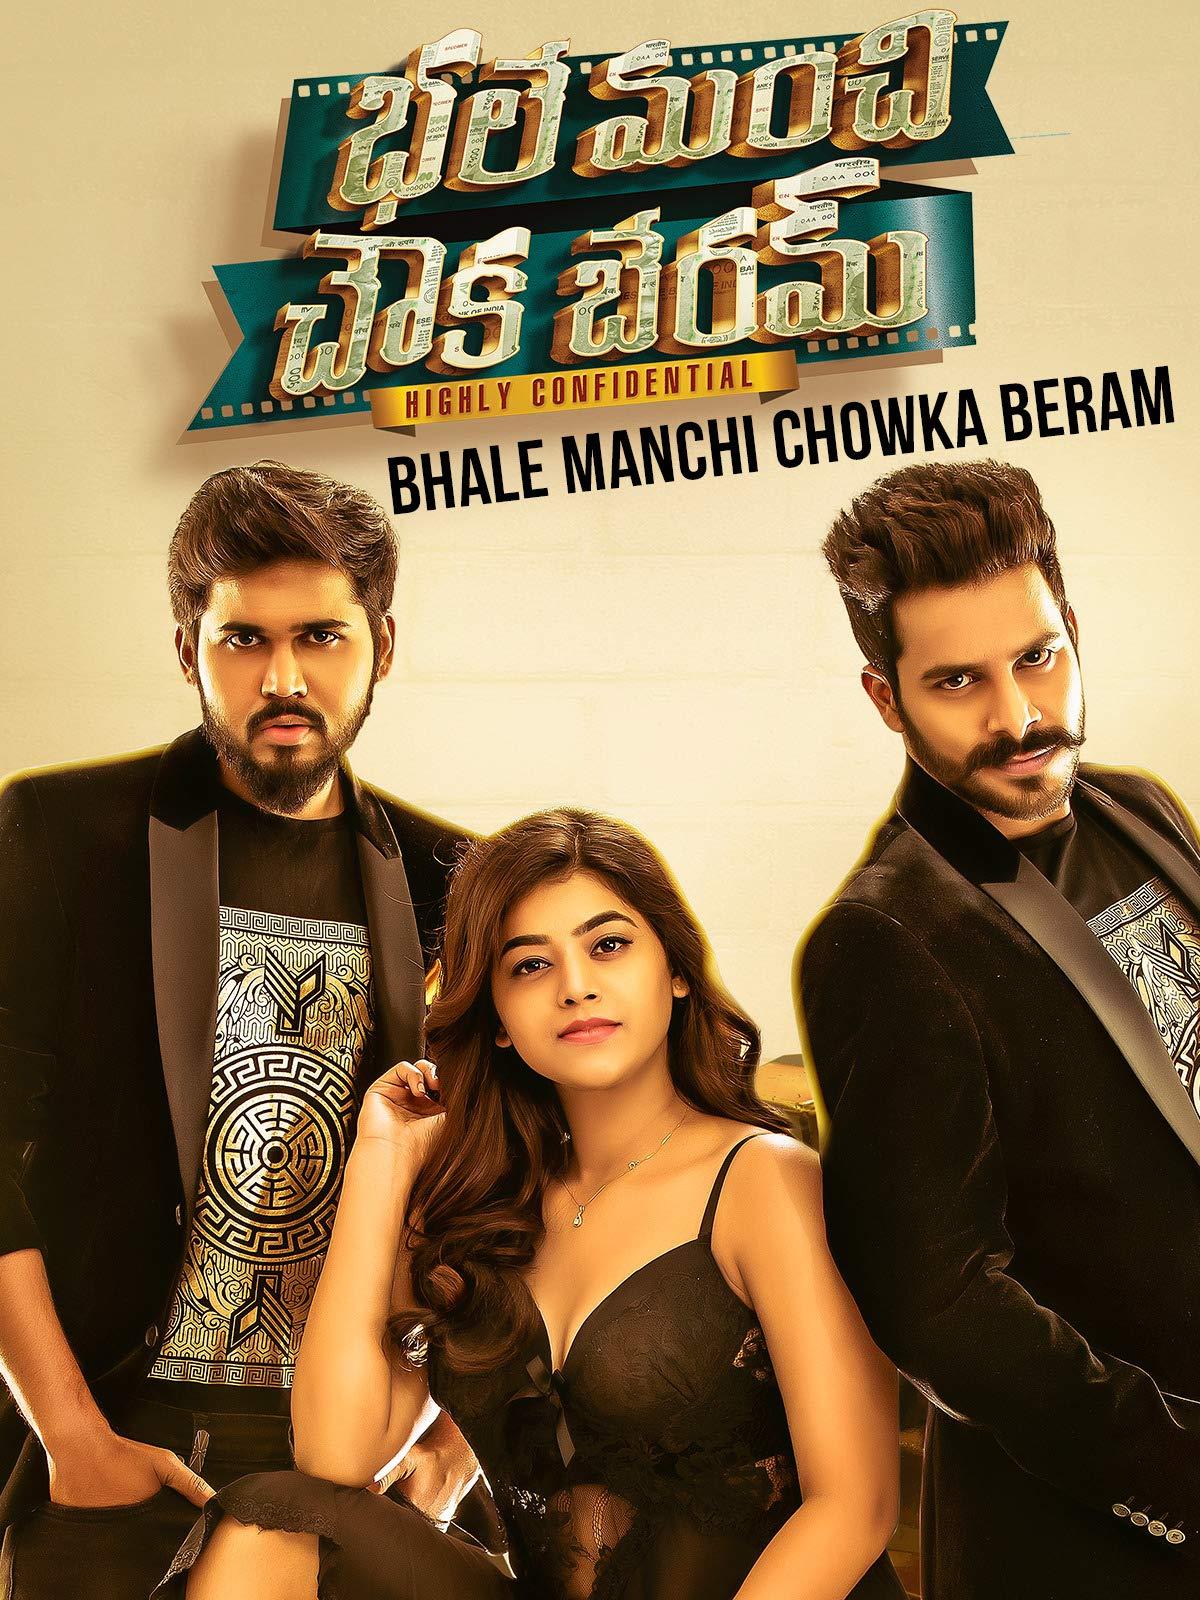 Watch Bhale Manchi Chowka Beram | Prime Video